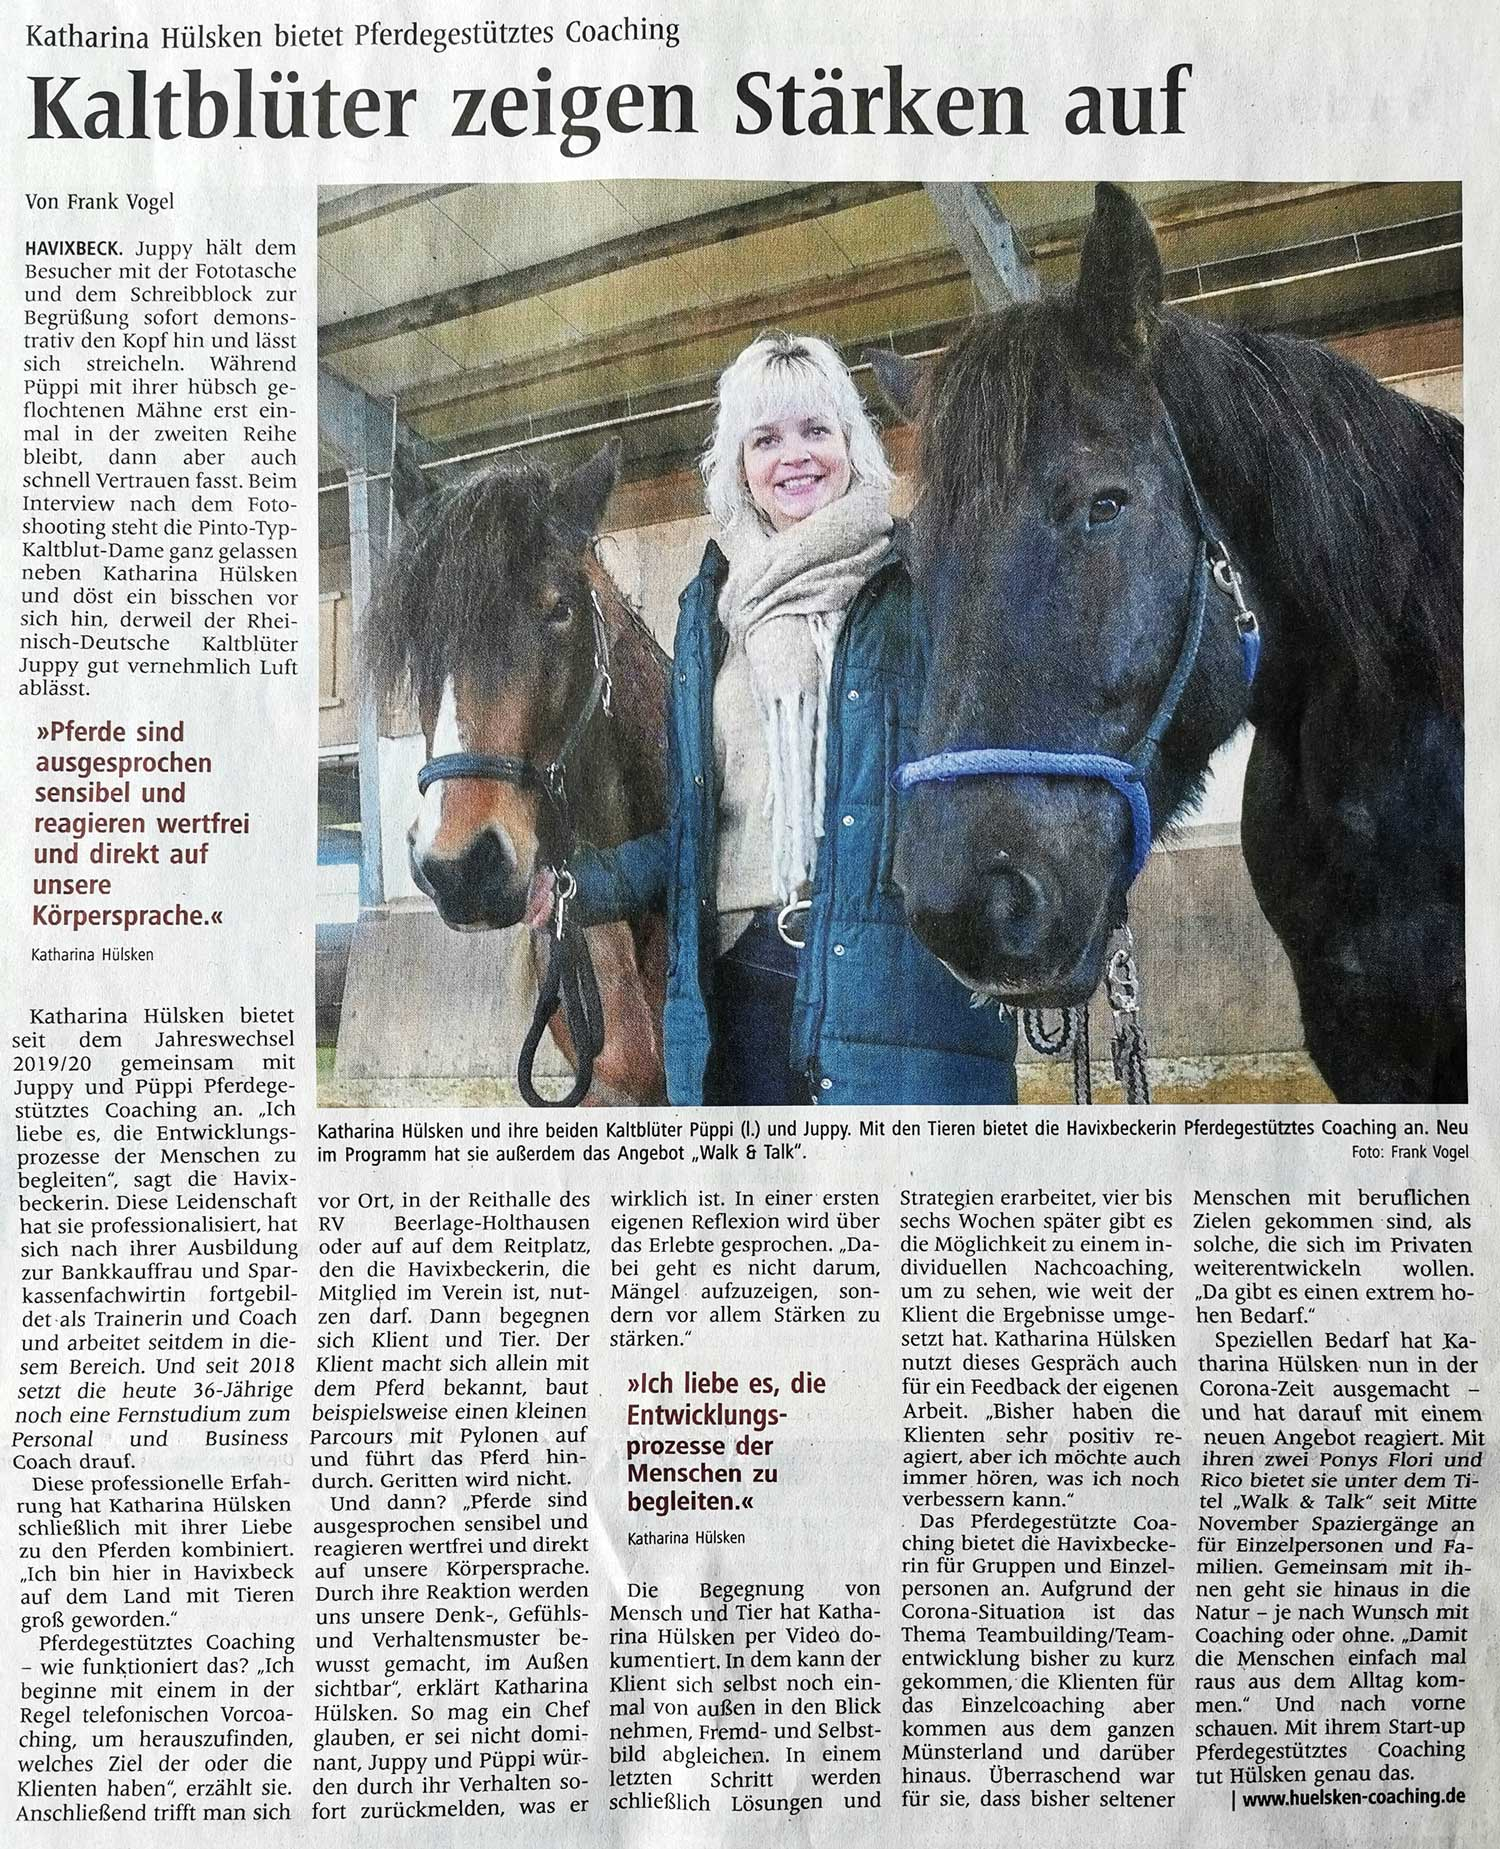 Pony Walk and Talk, Hülsken Coaching, Pferdegestütztes Coaching, Pferde, Katharina Hülsken, Havixbeck, Münsterland, Baumberge